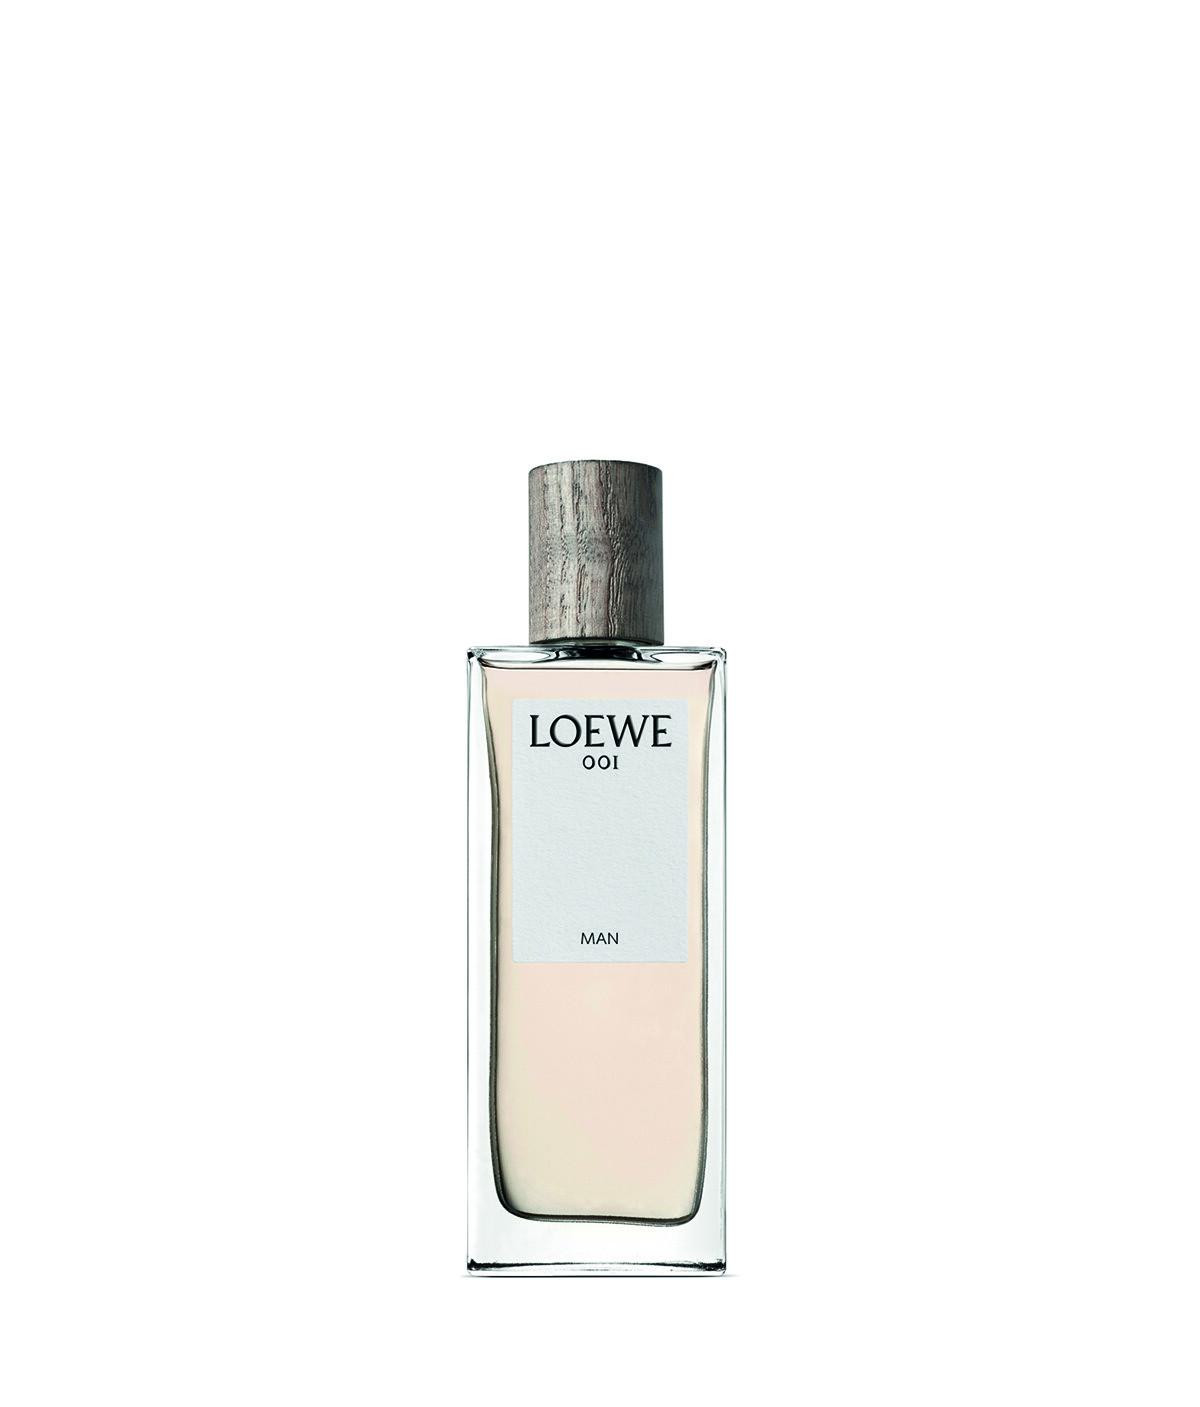 LOEWE Loewe 001 Man Edp 50Ml colourless front